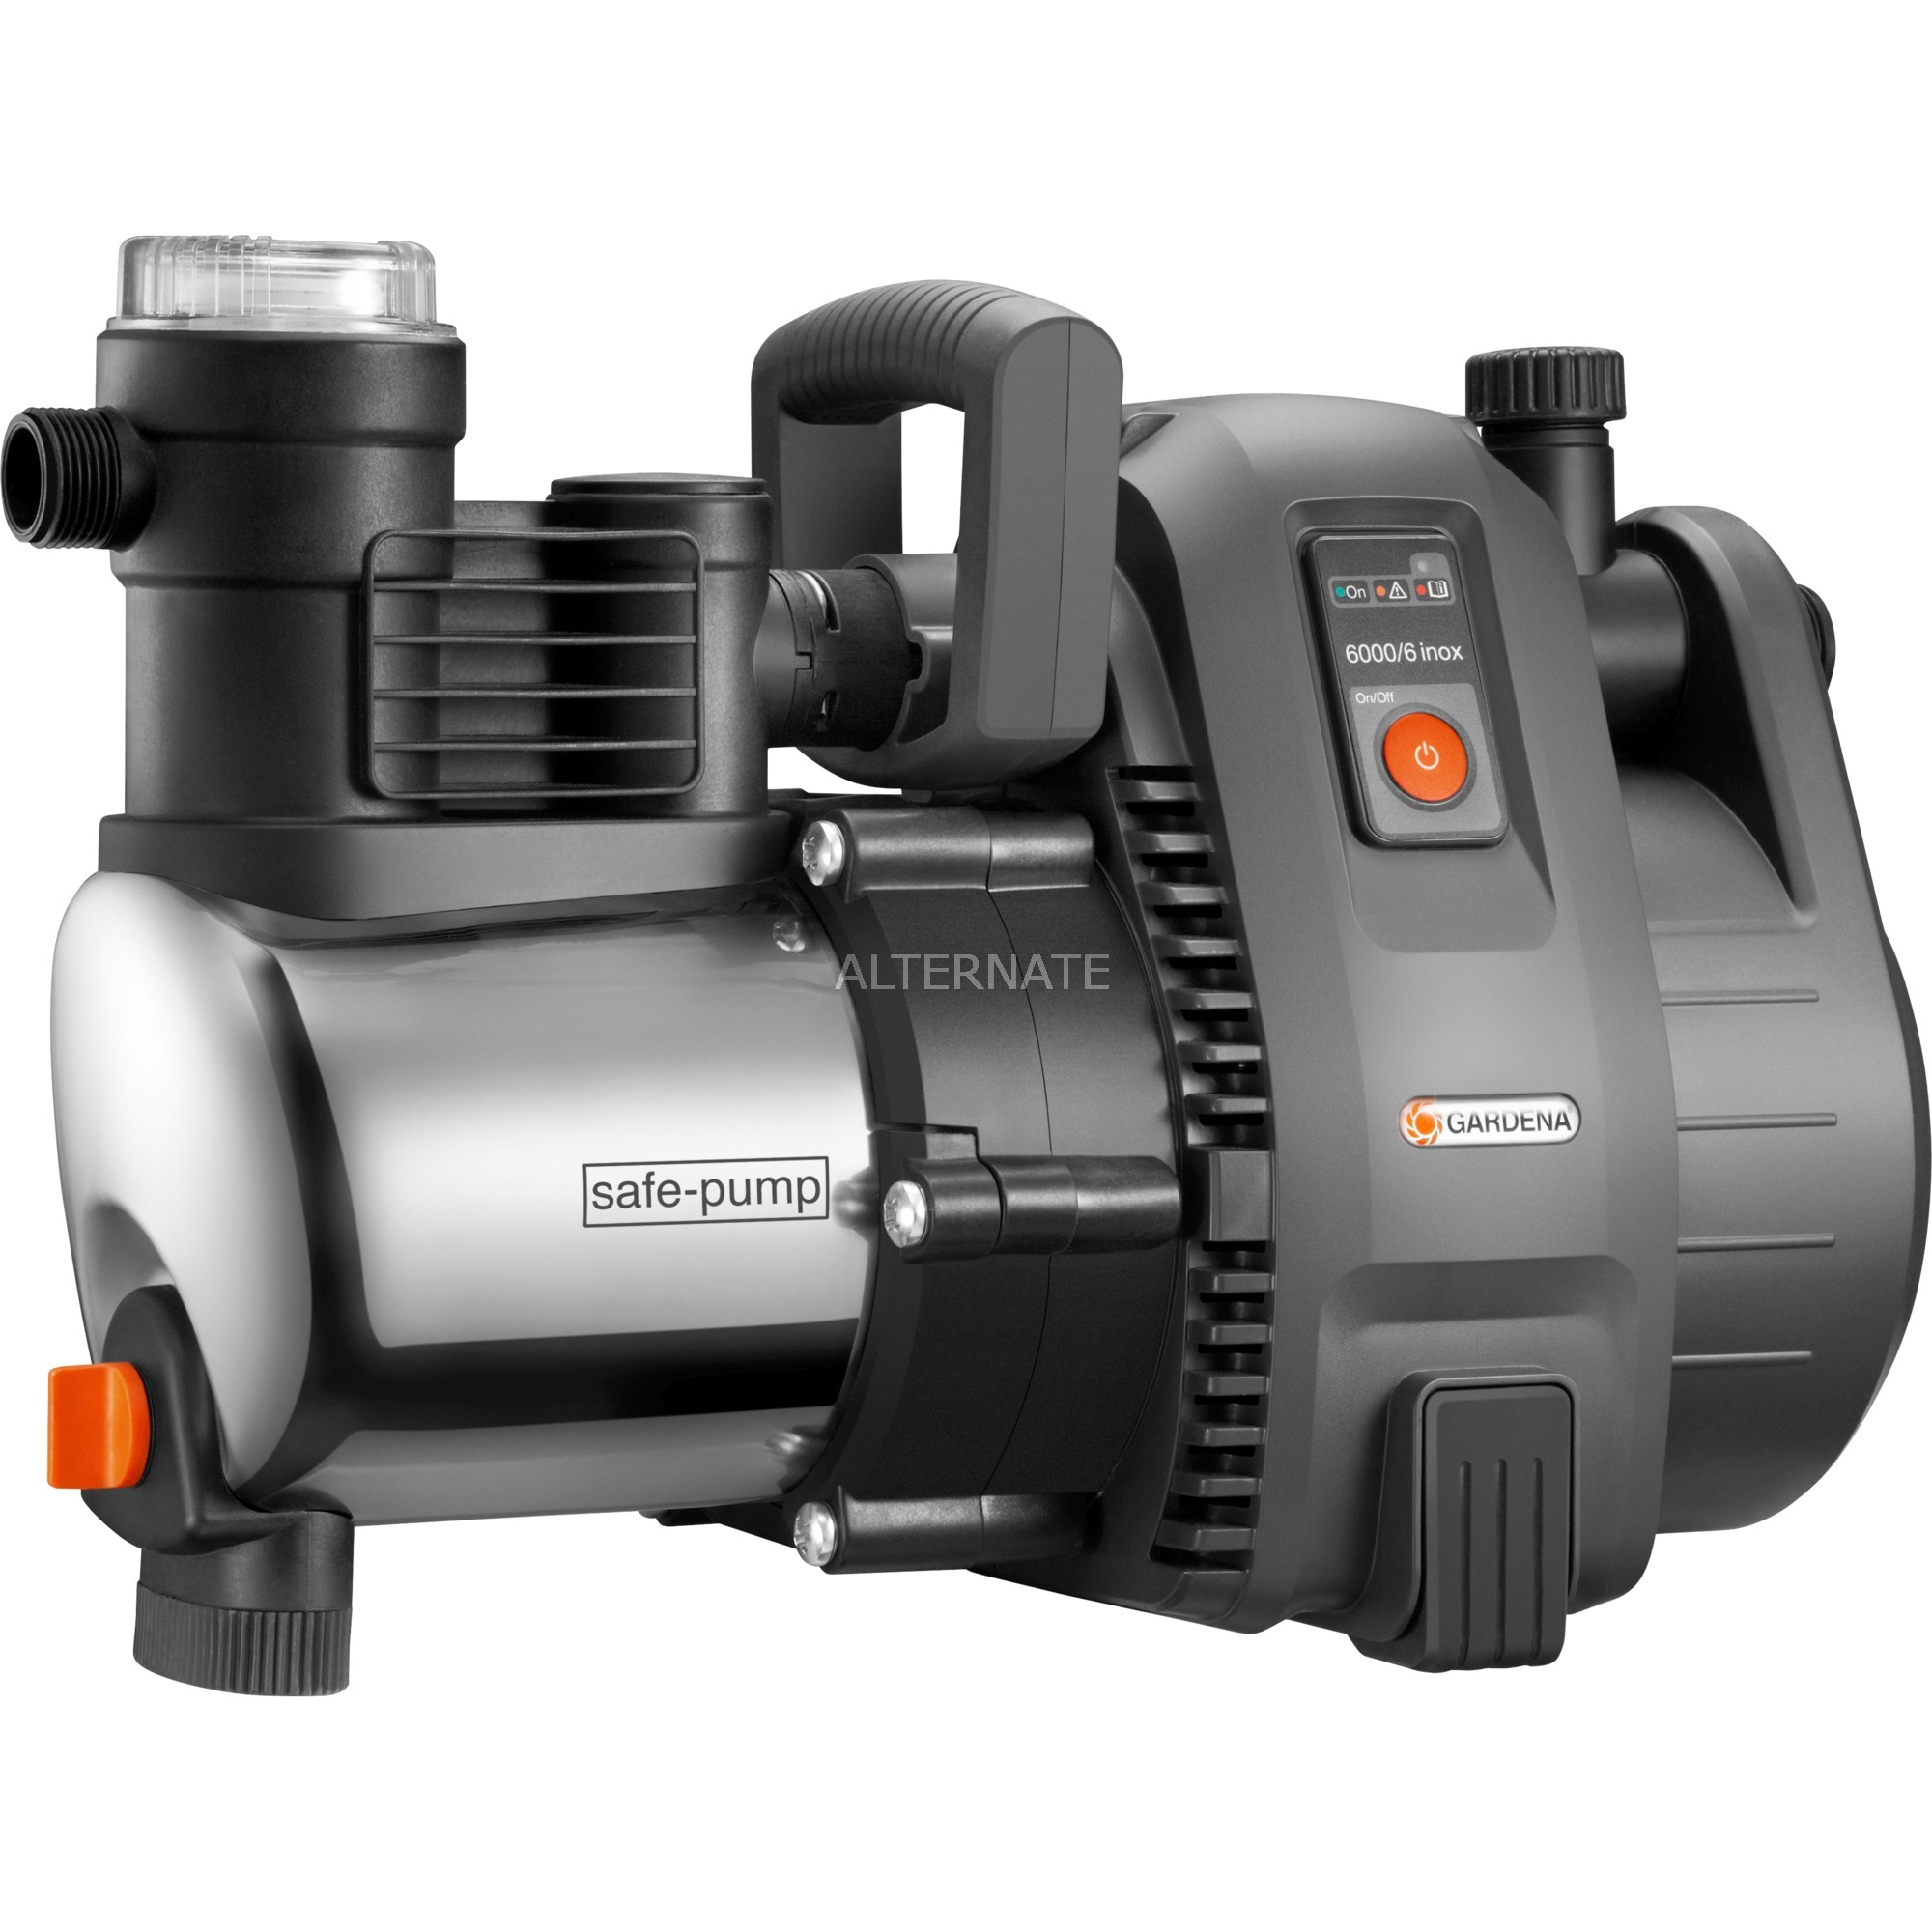 60006-inox-havepumpe-55bar-6000lt-1300w